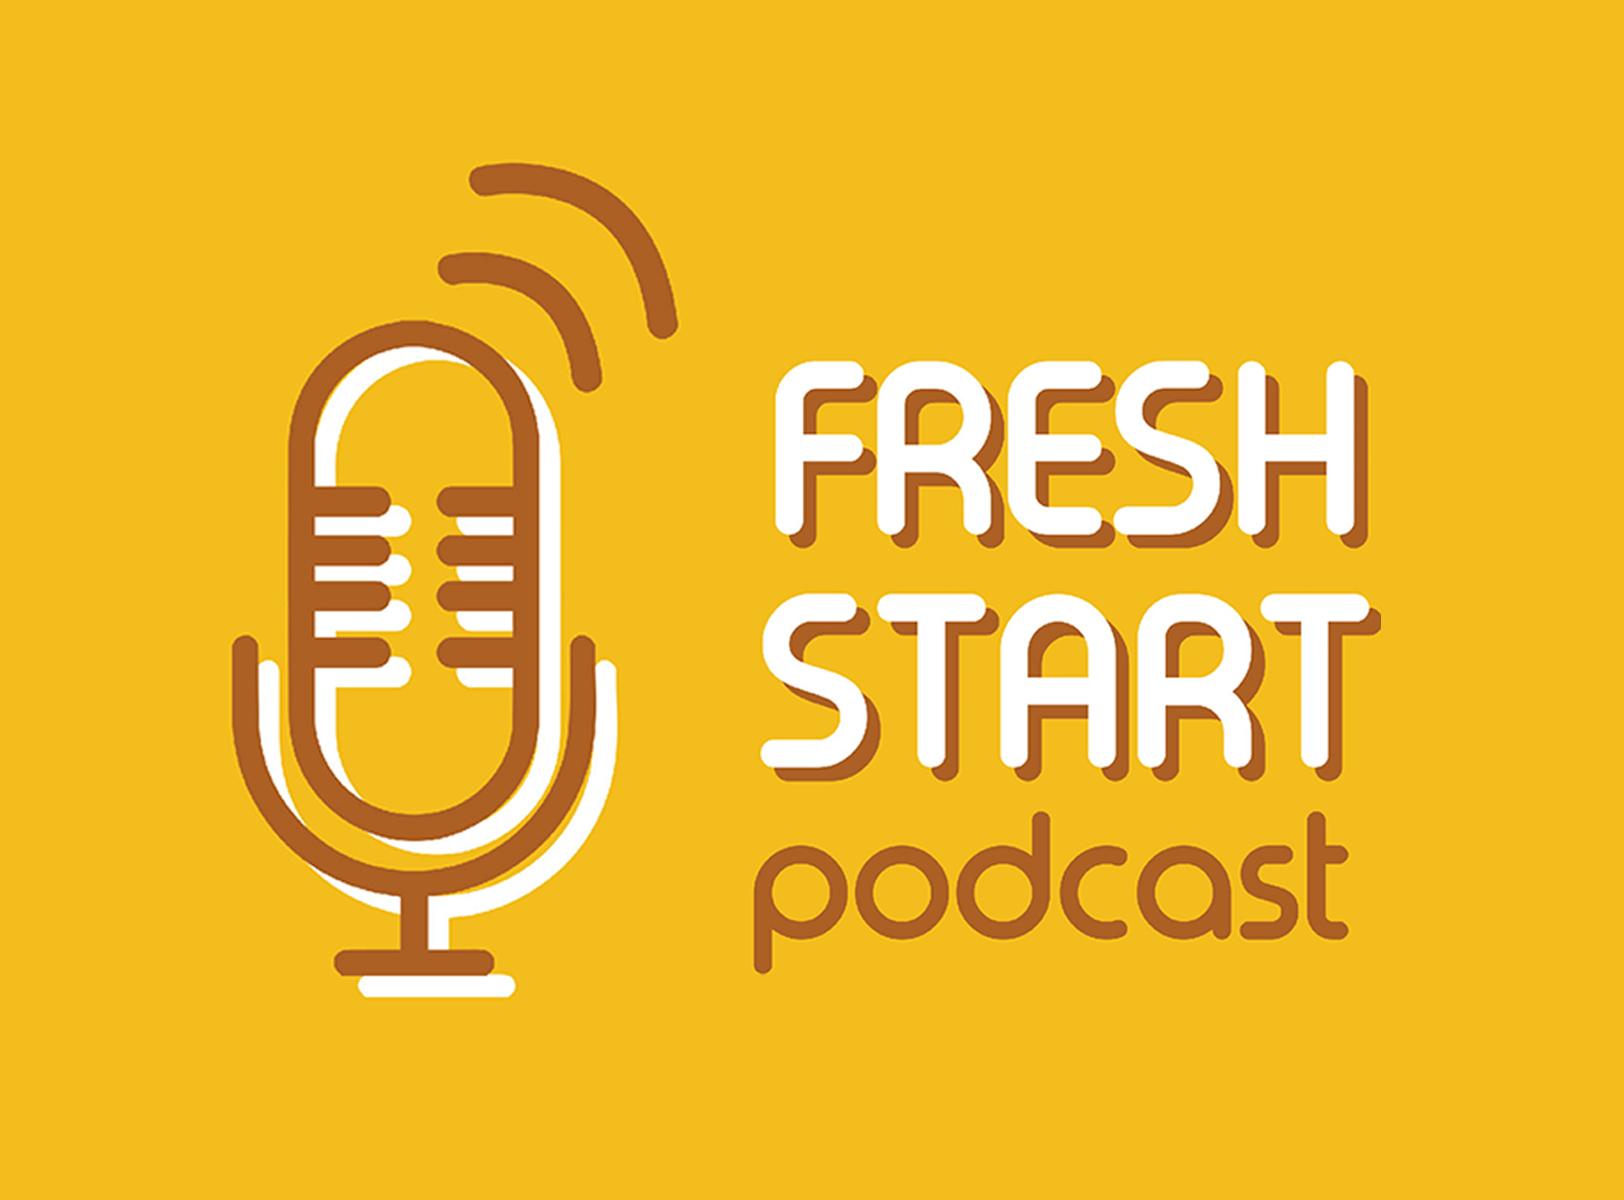 Fresh Start: Podcast News (2/1/2019 Fri.)